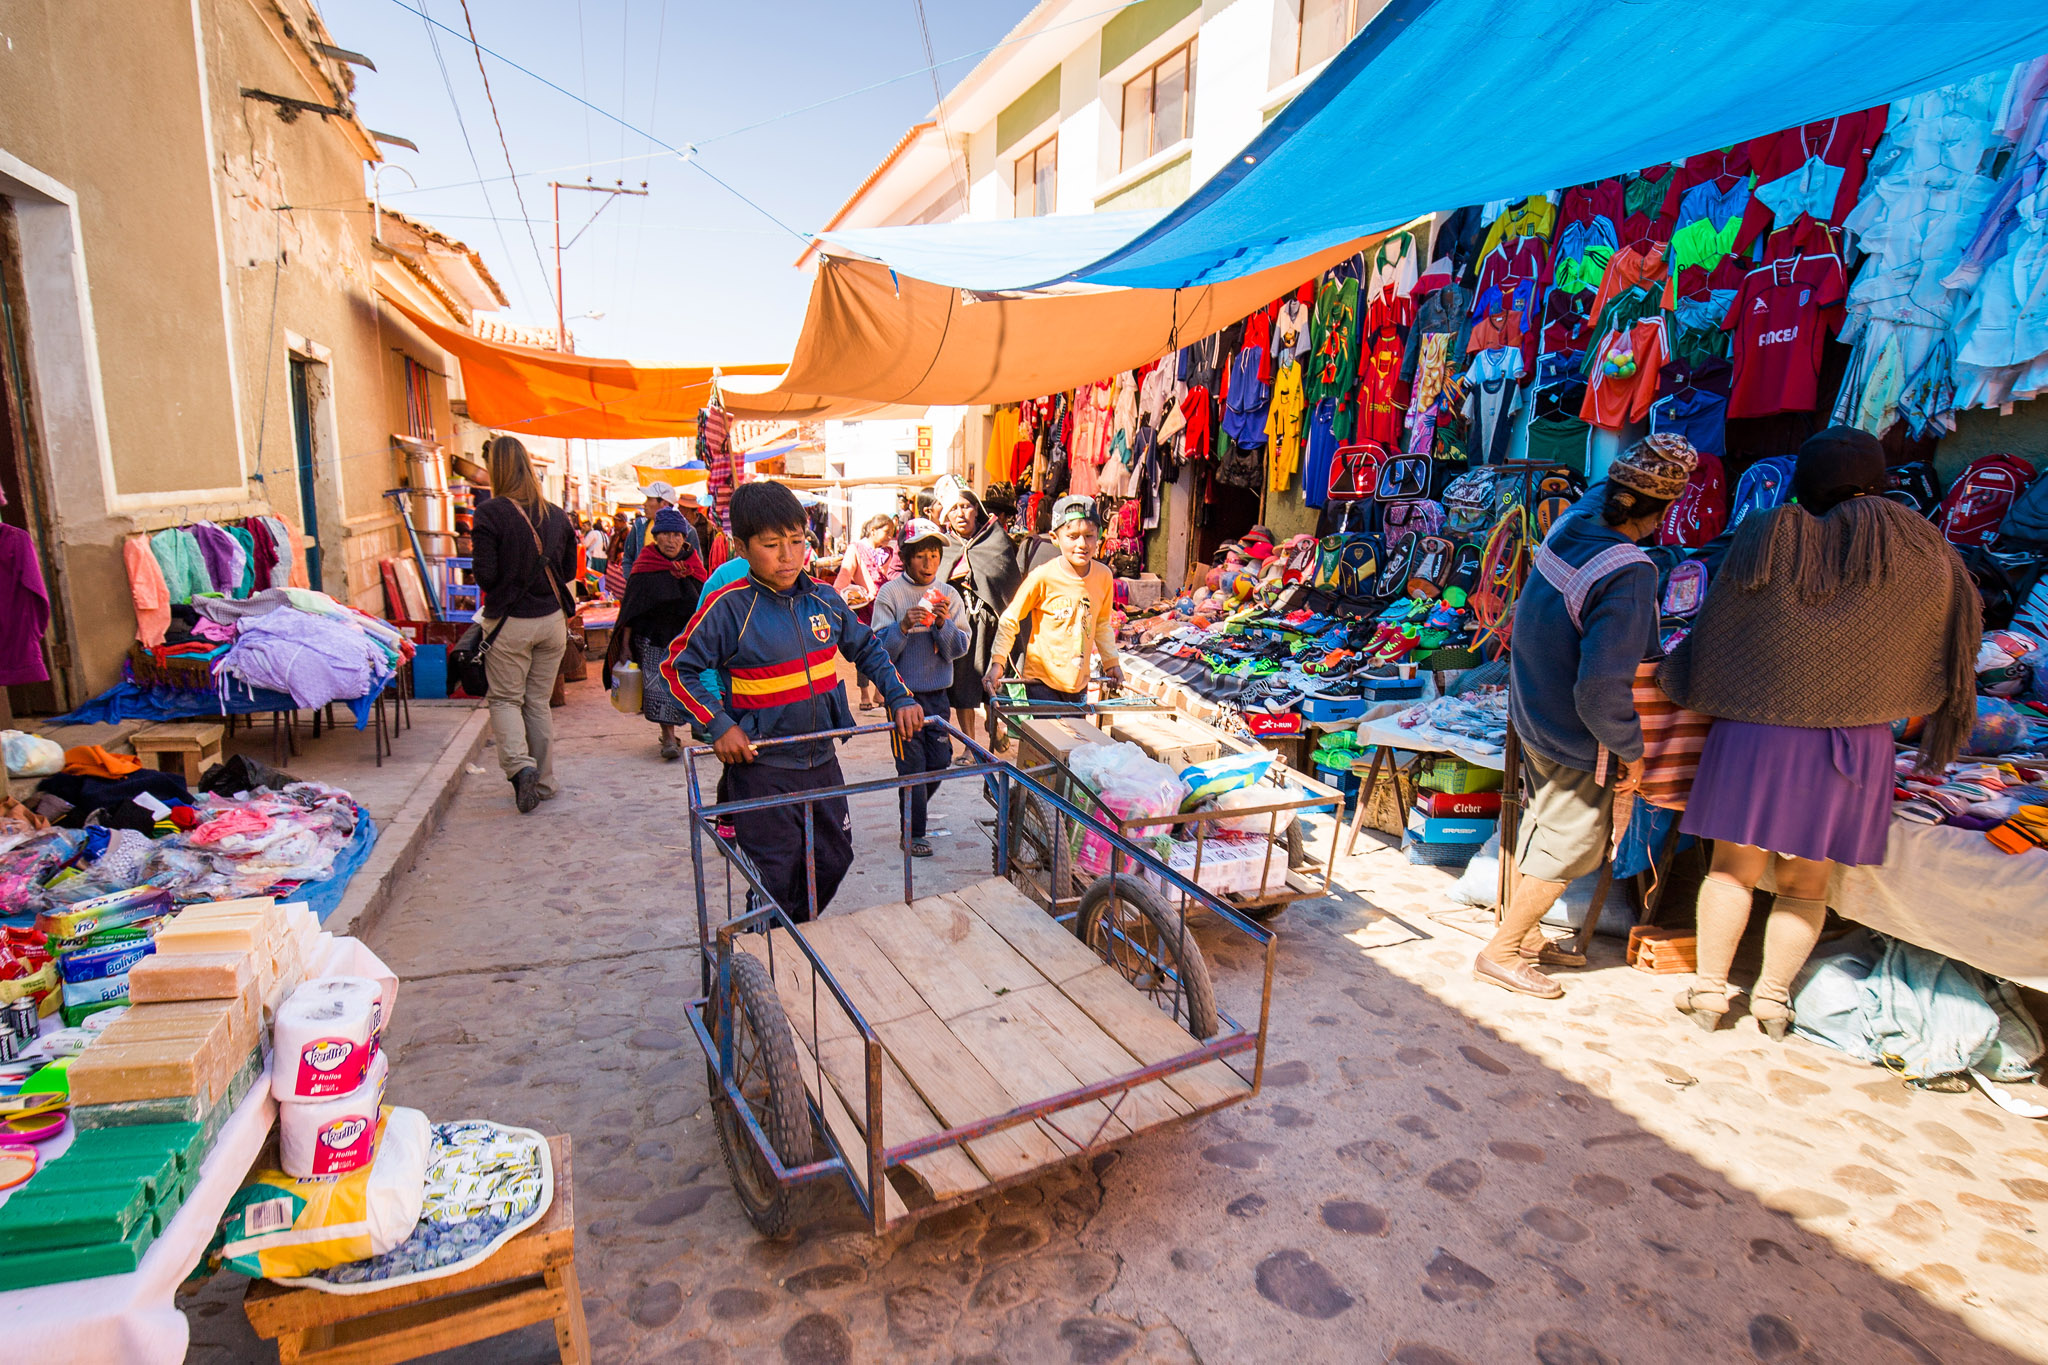 bolivia-market-boy-working-rural